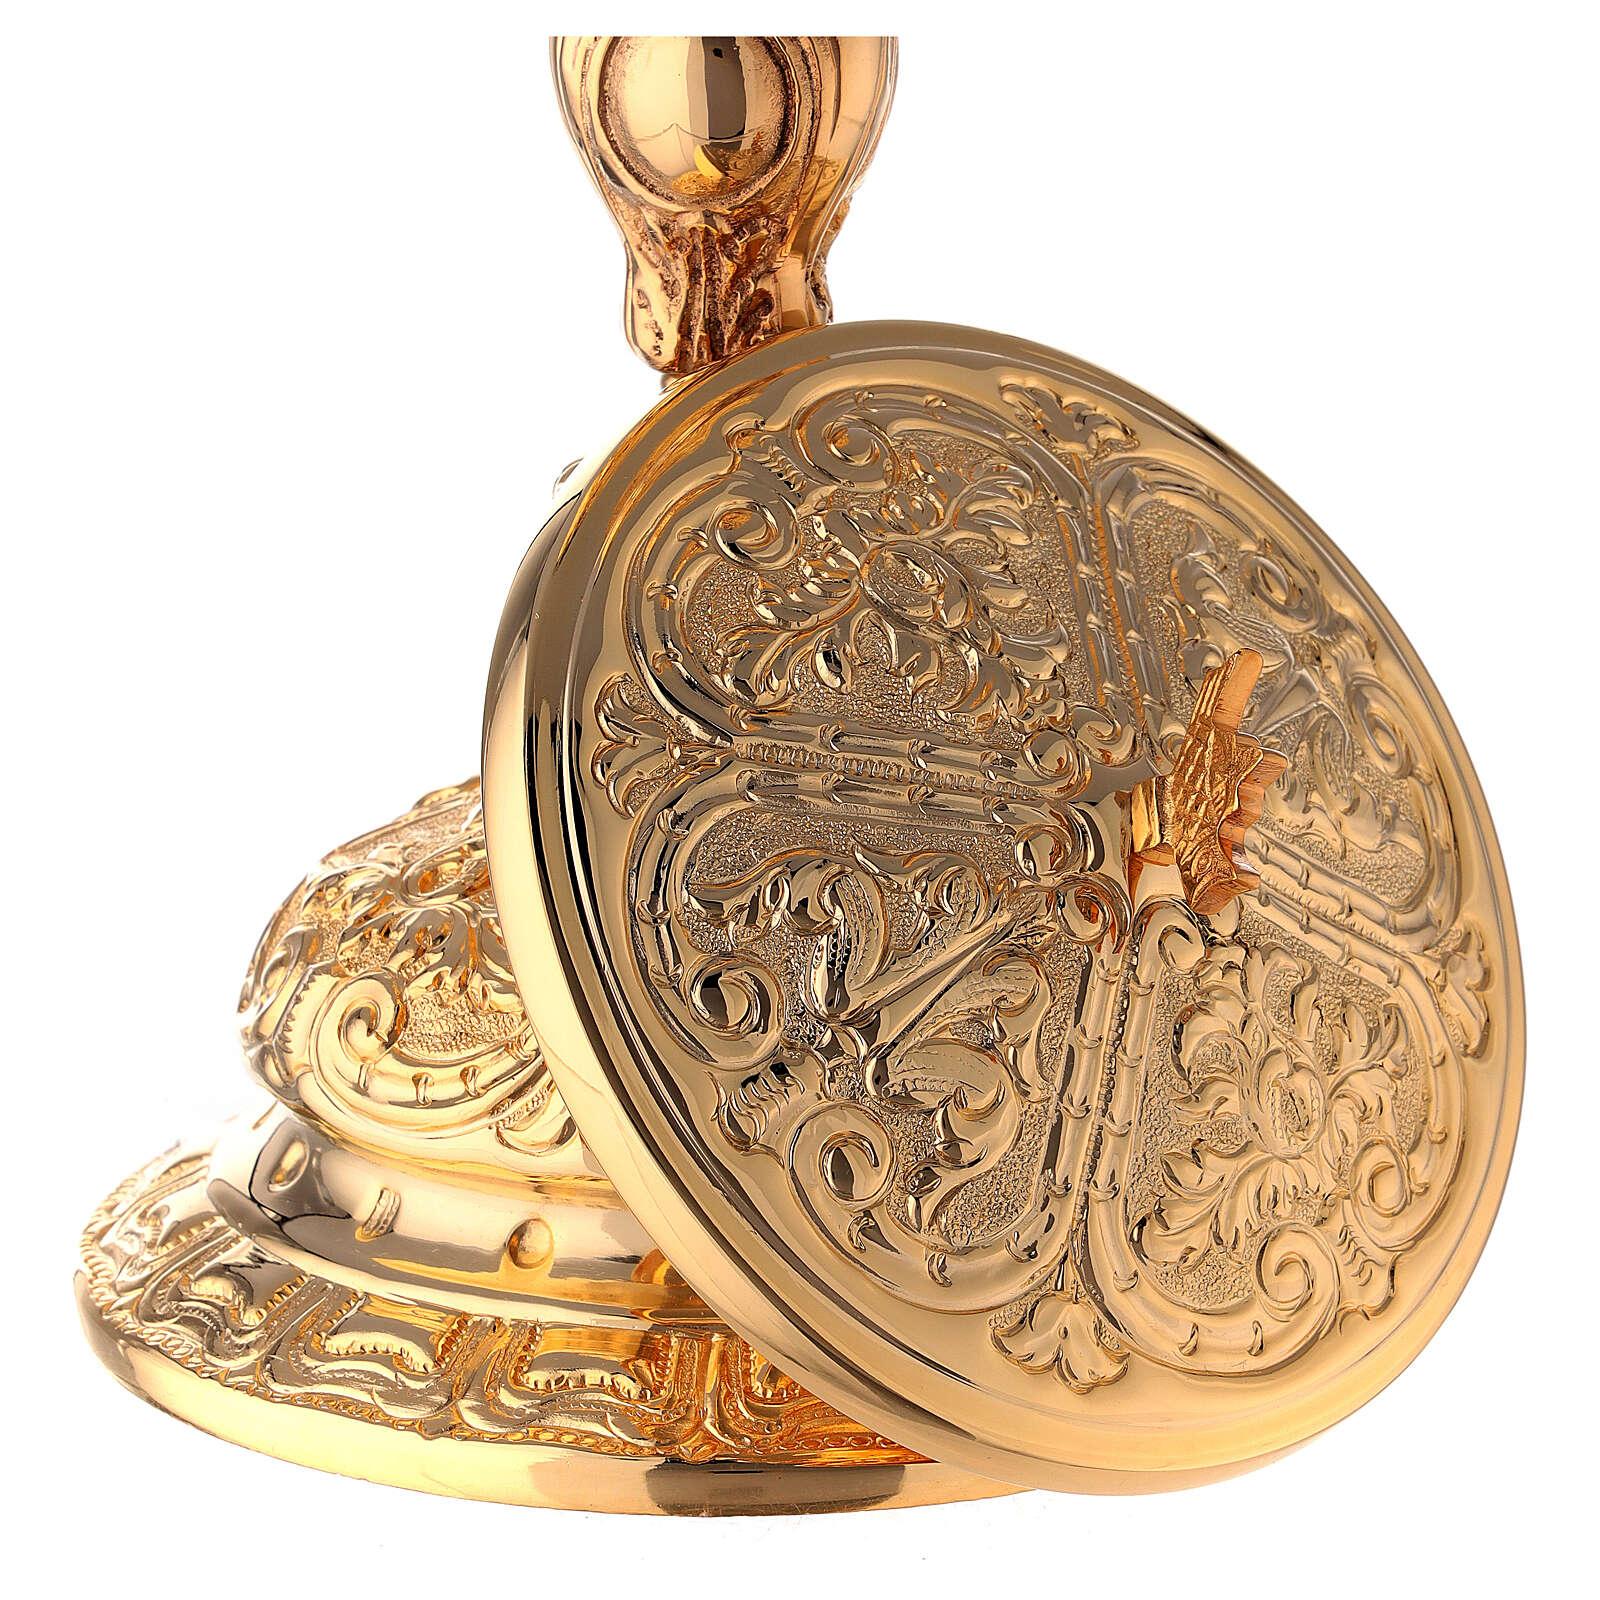 Baroque gold plated ciborium bread and fish handle 10 1/2 in 4